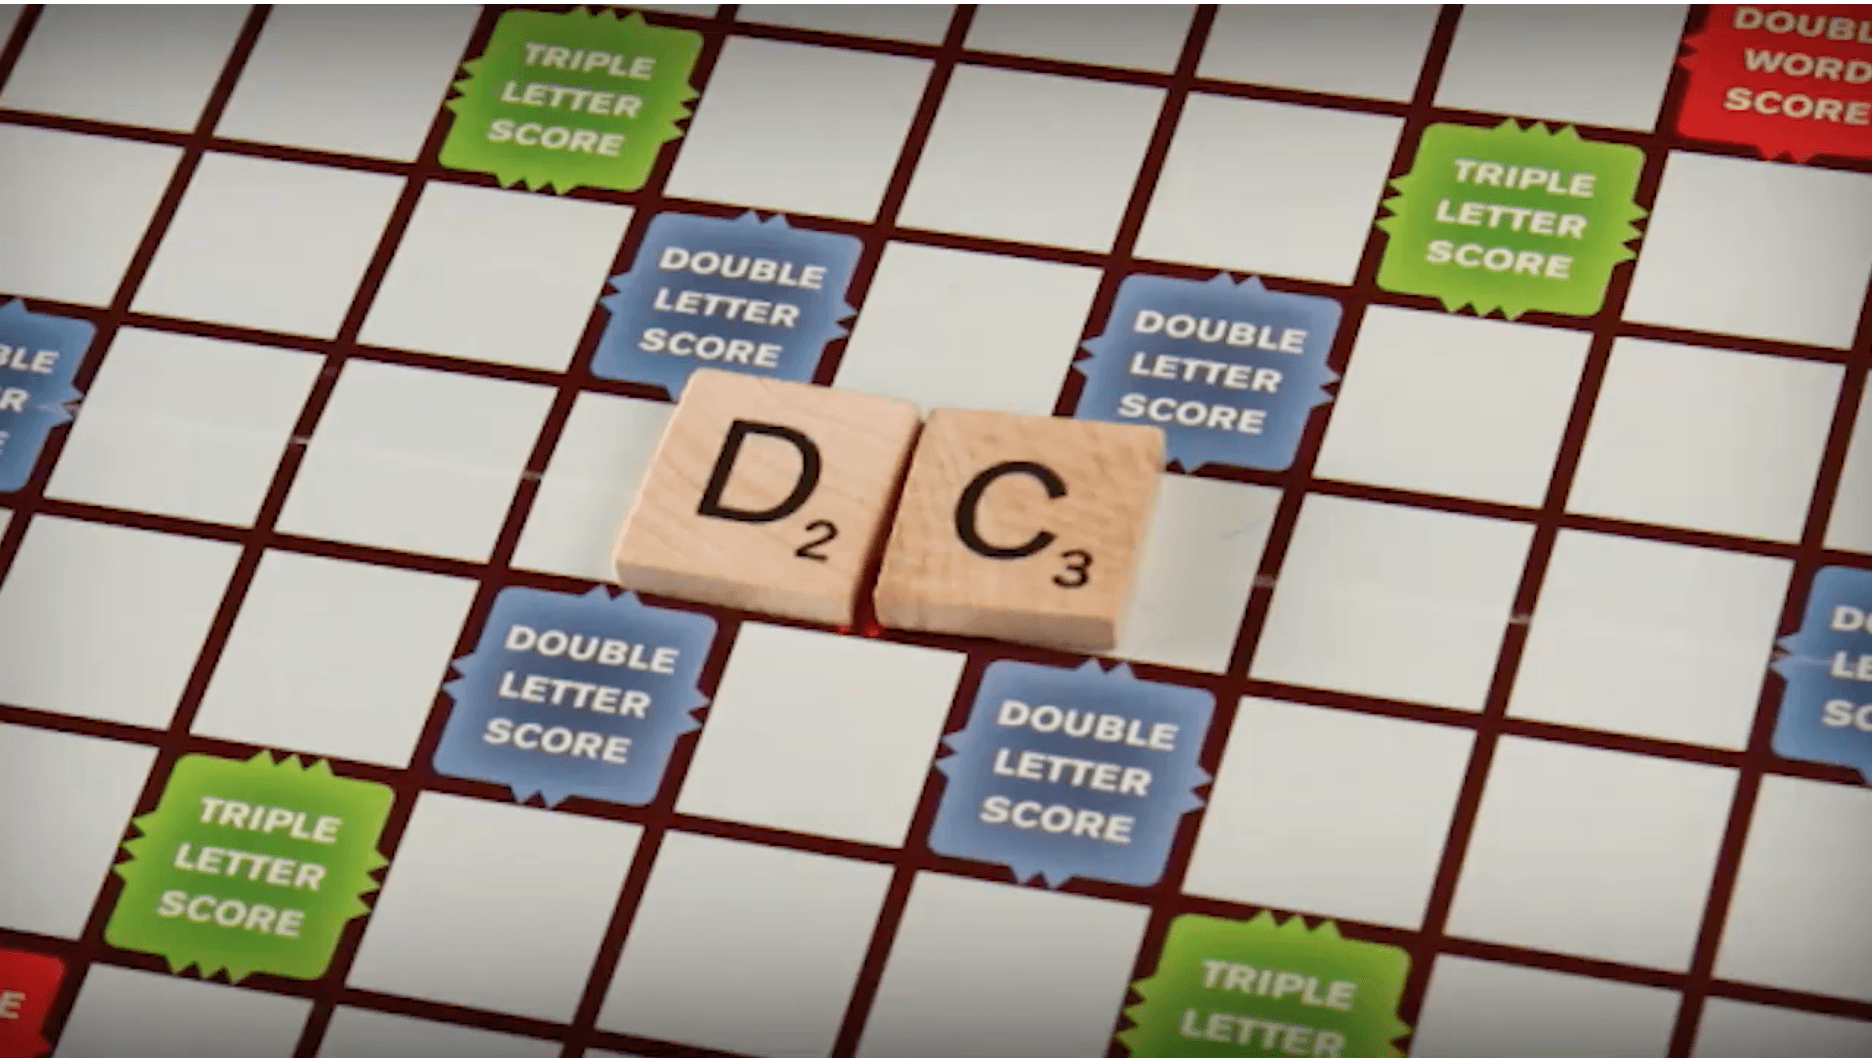 NRCC – Scrabble